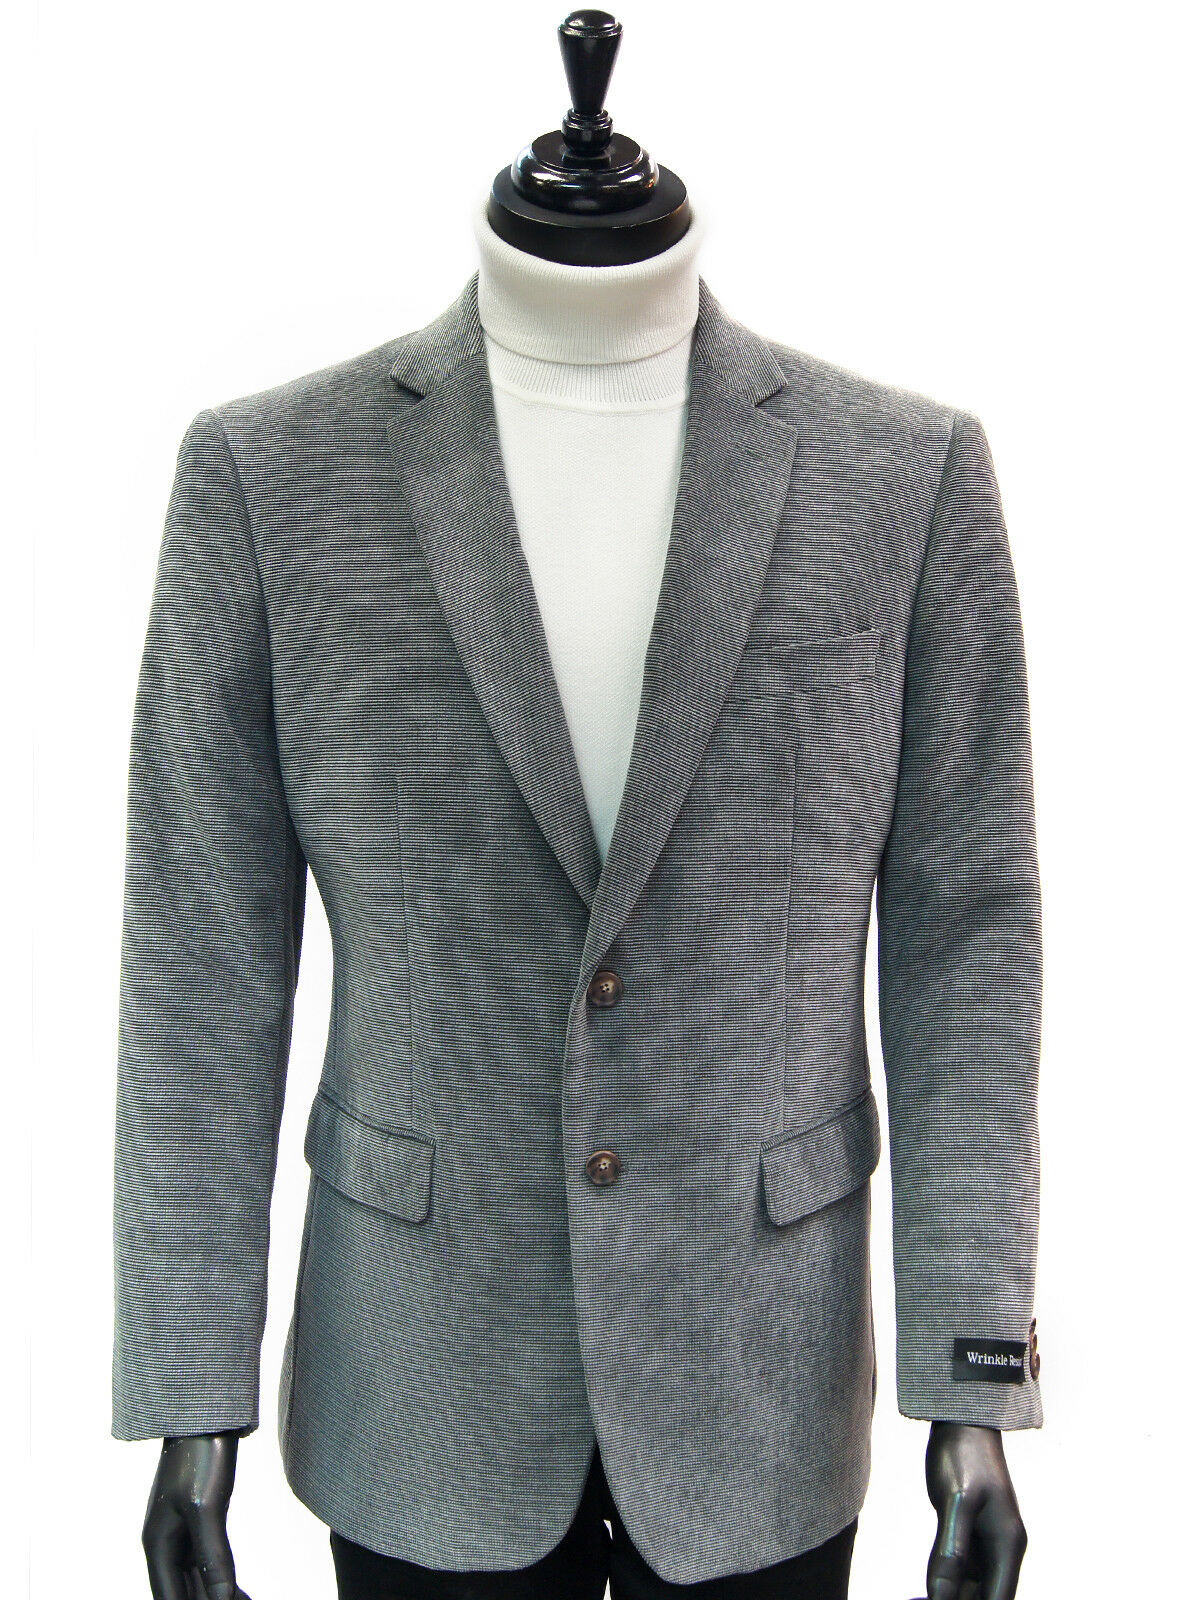 Affazzy Mens grau Chenille Texture Wrinkle Resistant 2 Button Work Casual Blazer